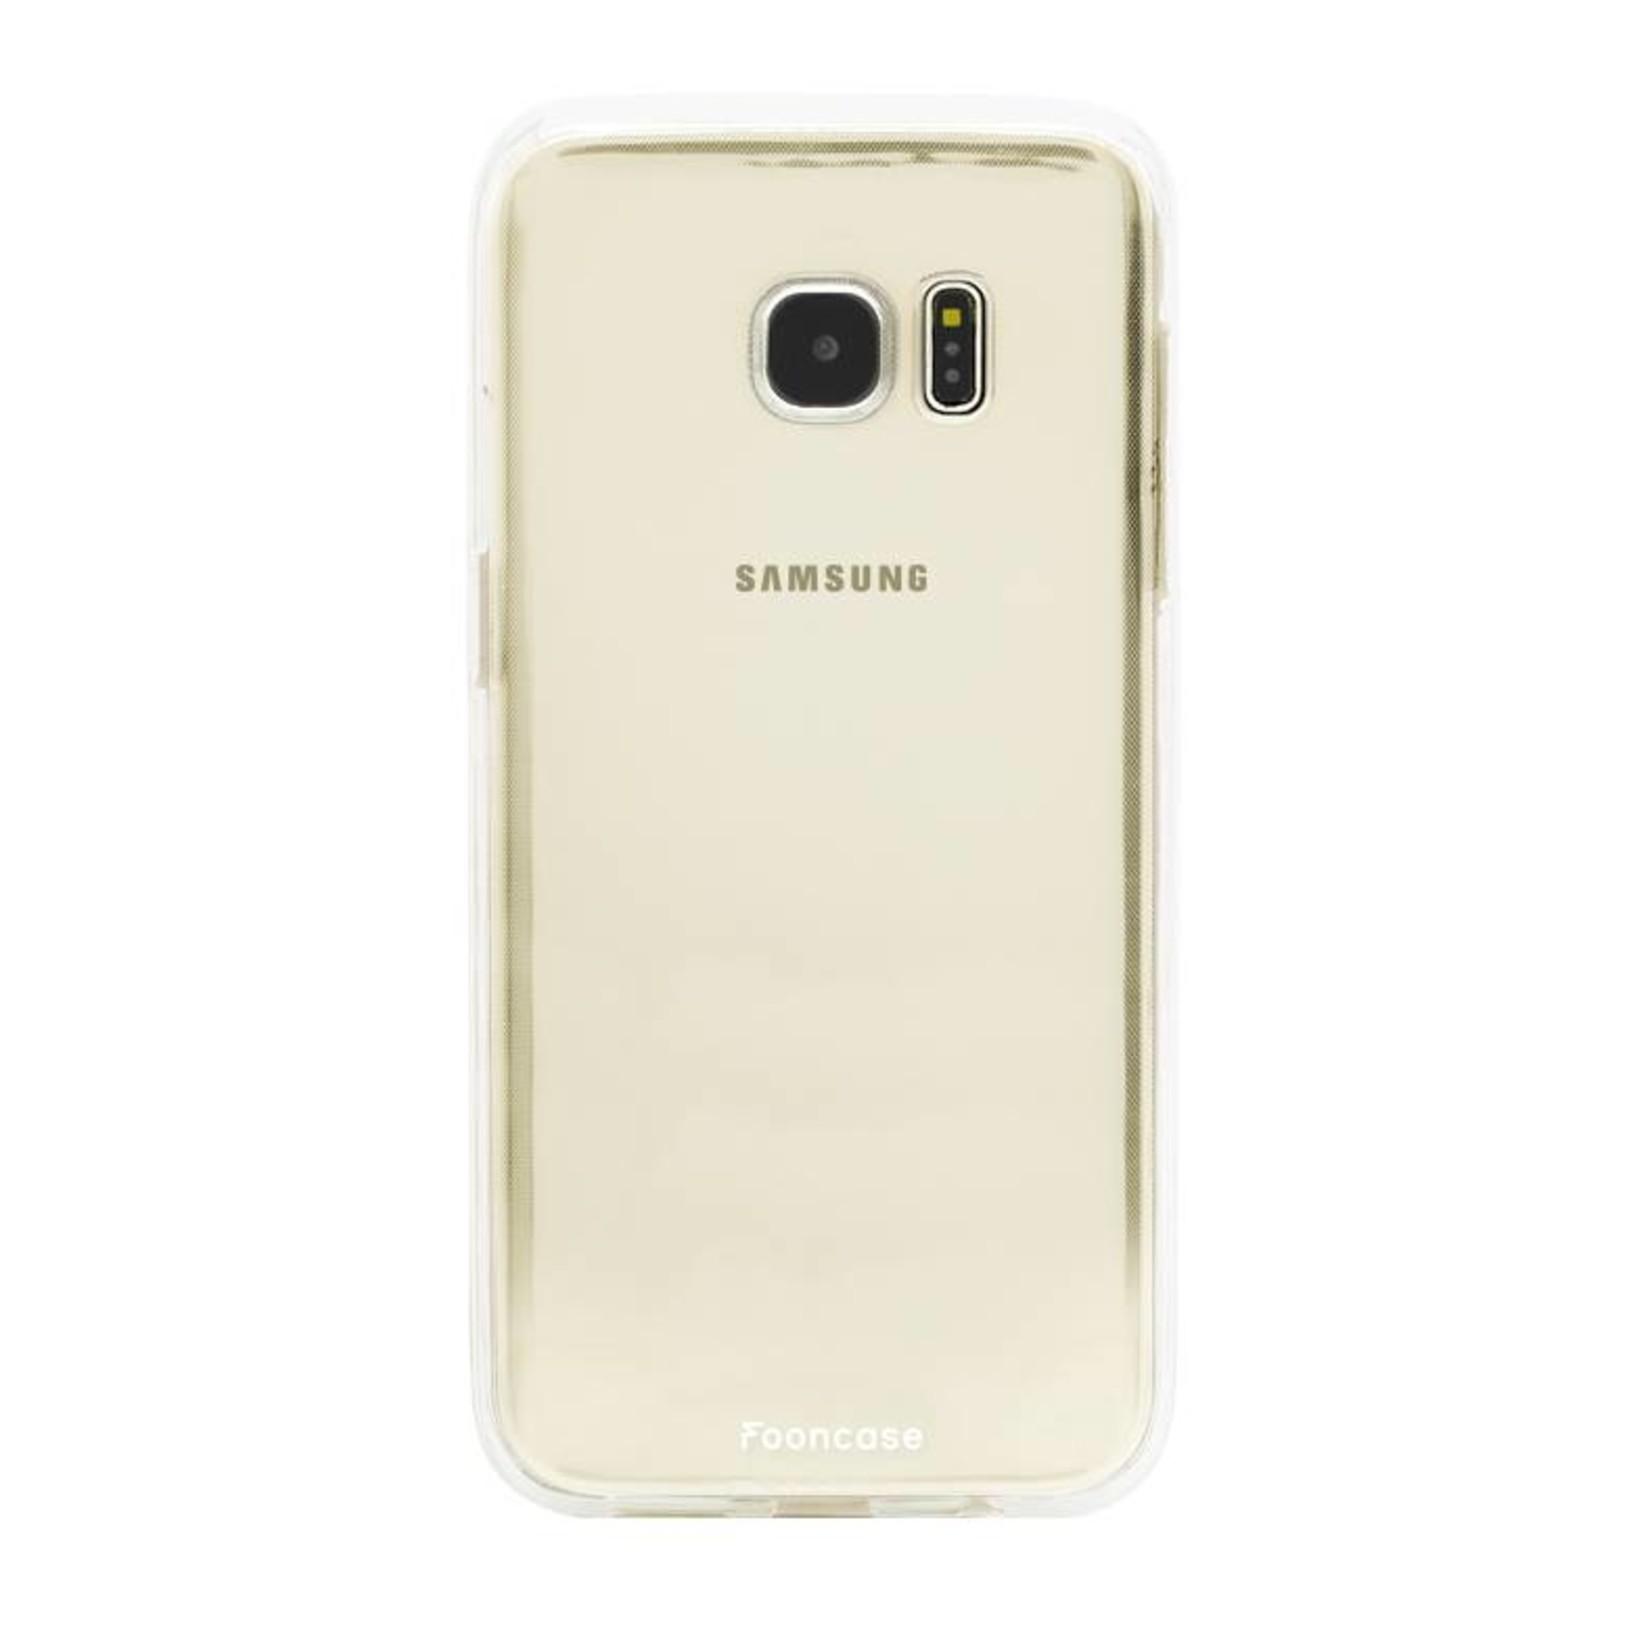 FOONCASE Samsung Galaxy S7 Edge Handyhülle - Transparant